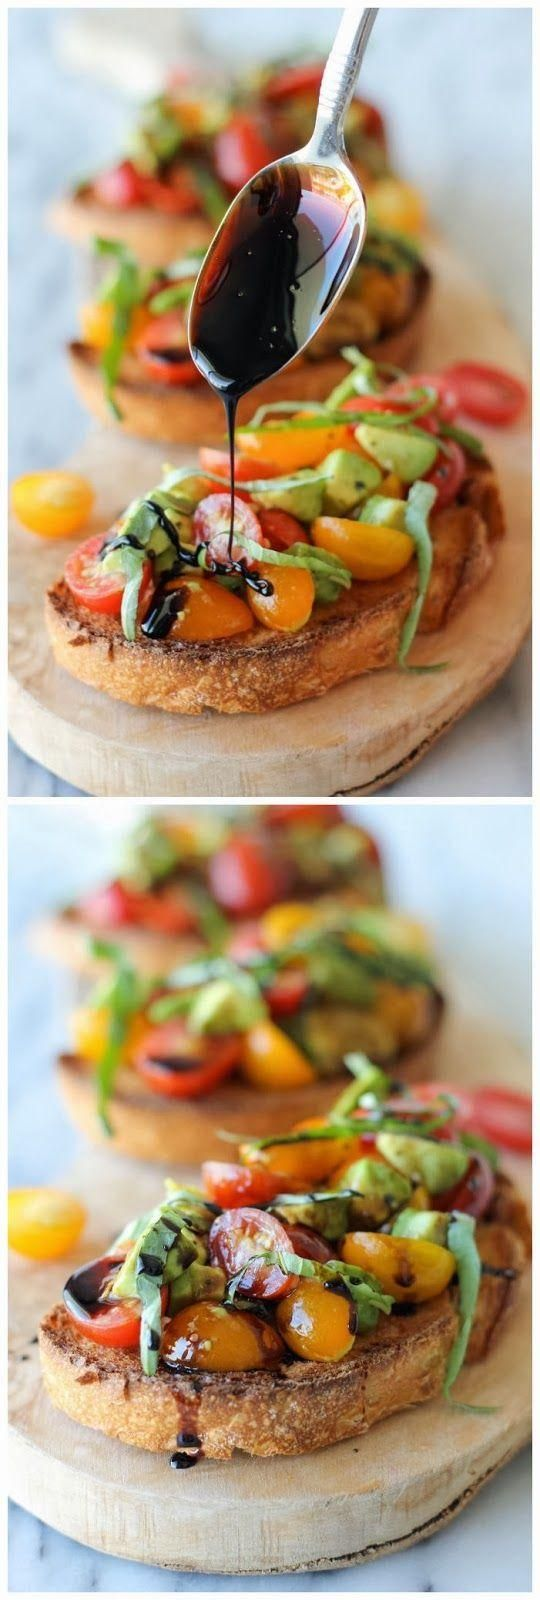 Avocado Bruschetta with Balsamic Reduction #avocado #bruschetta #appetizer